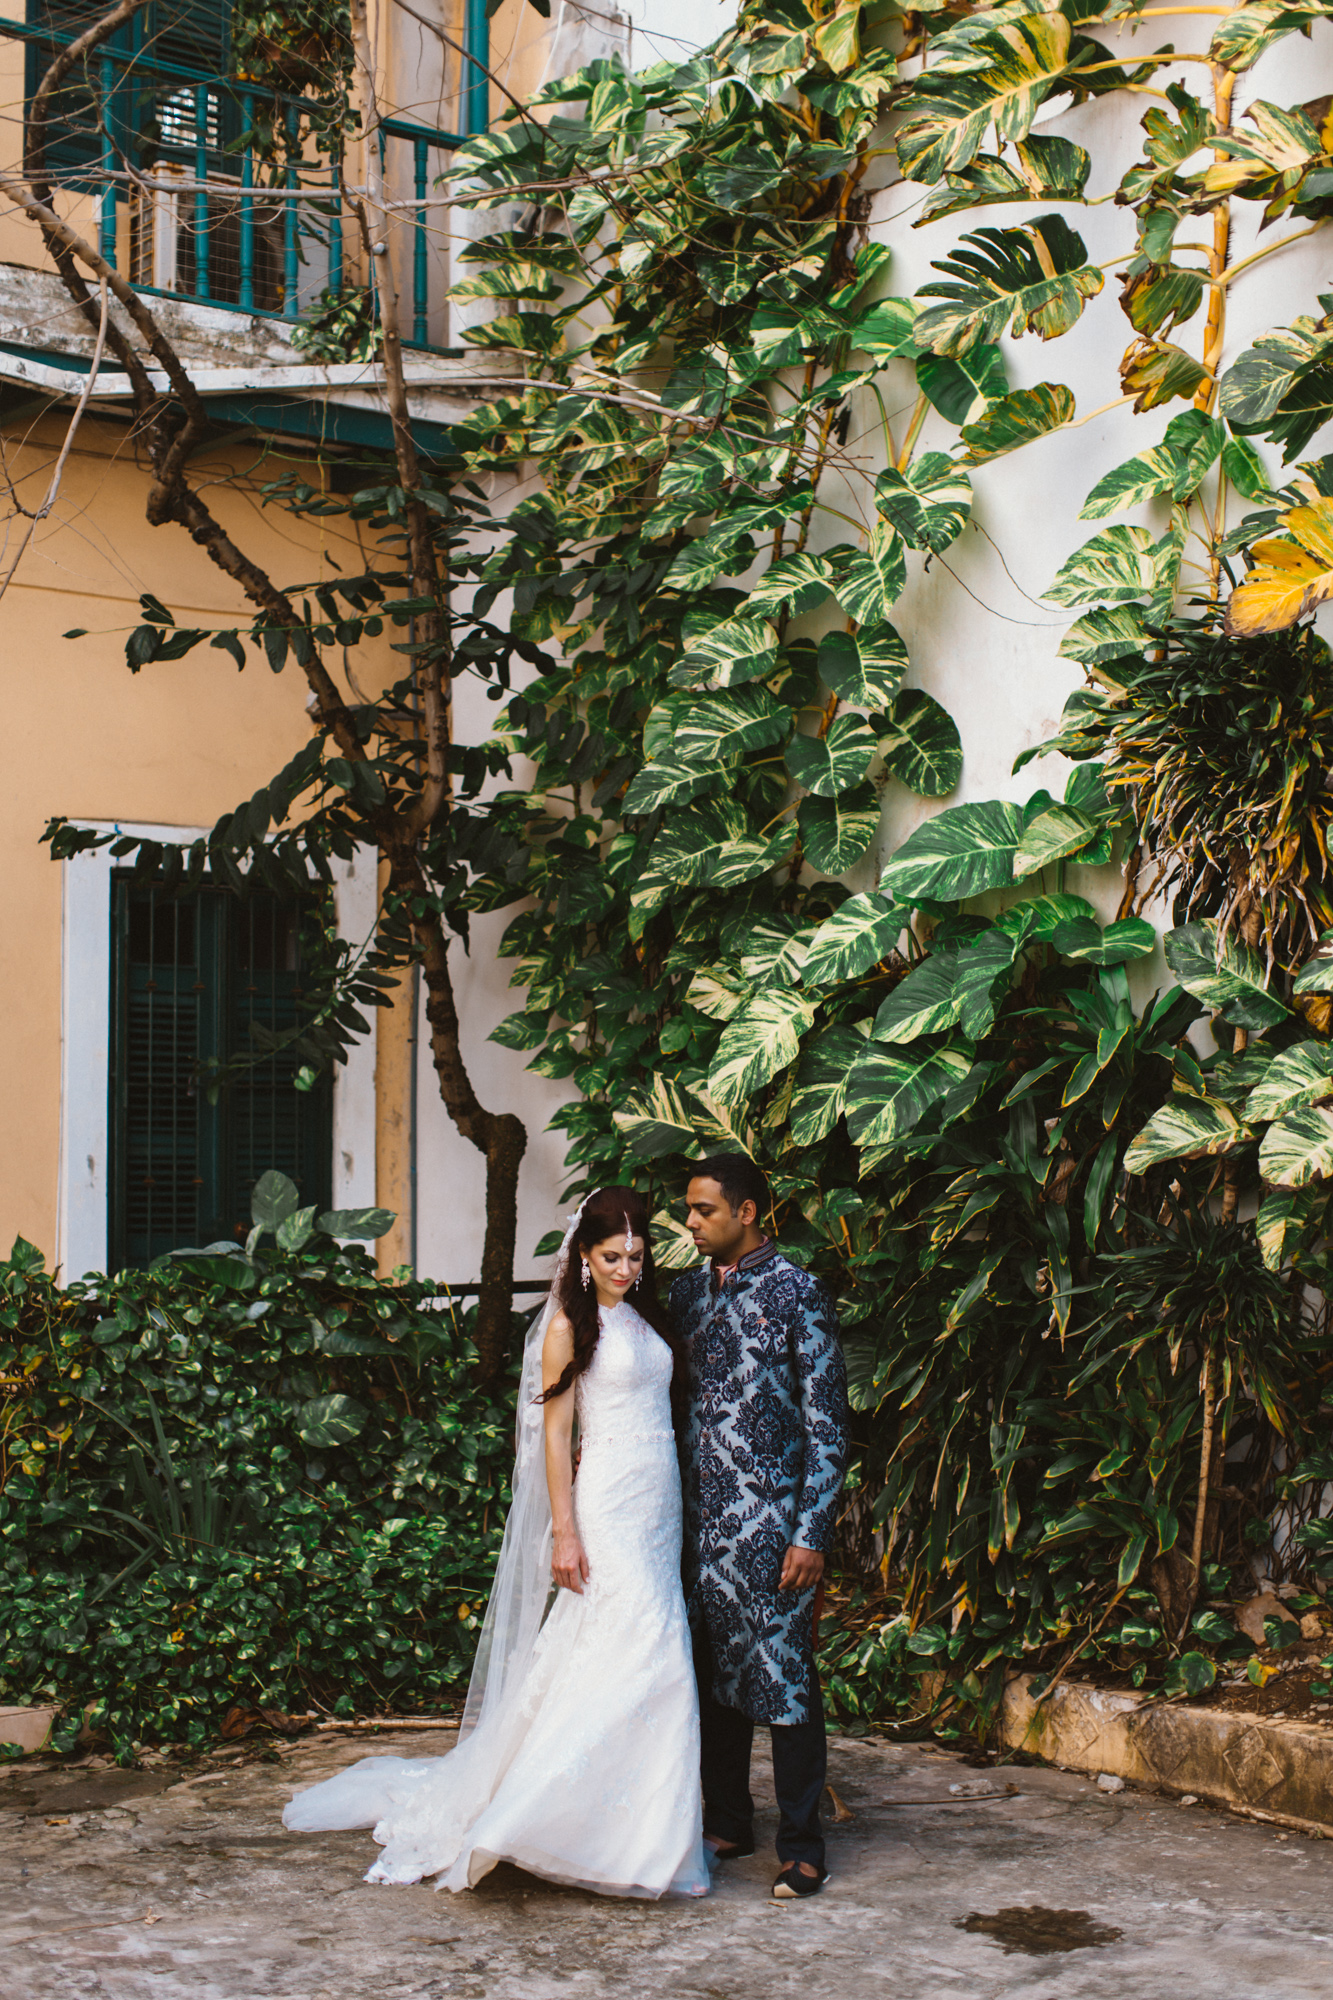 Puerto Rico Wedding Photography Destination Photographer Boris Zaretsky San Juan PR Casino Antiguo La Concha _B2C6564.jpg